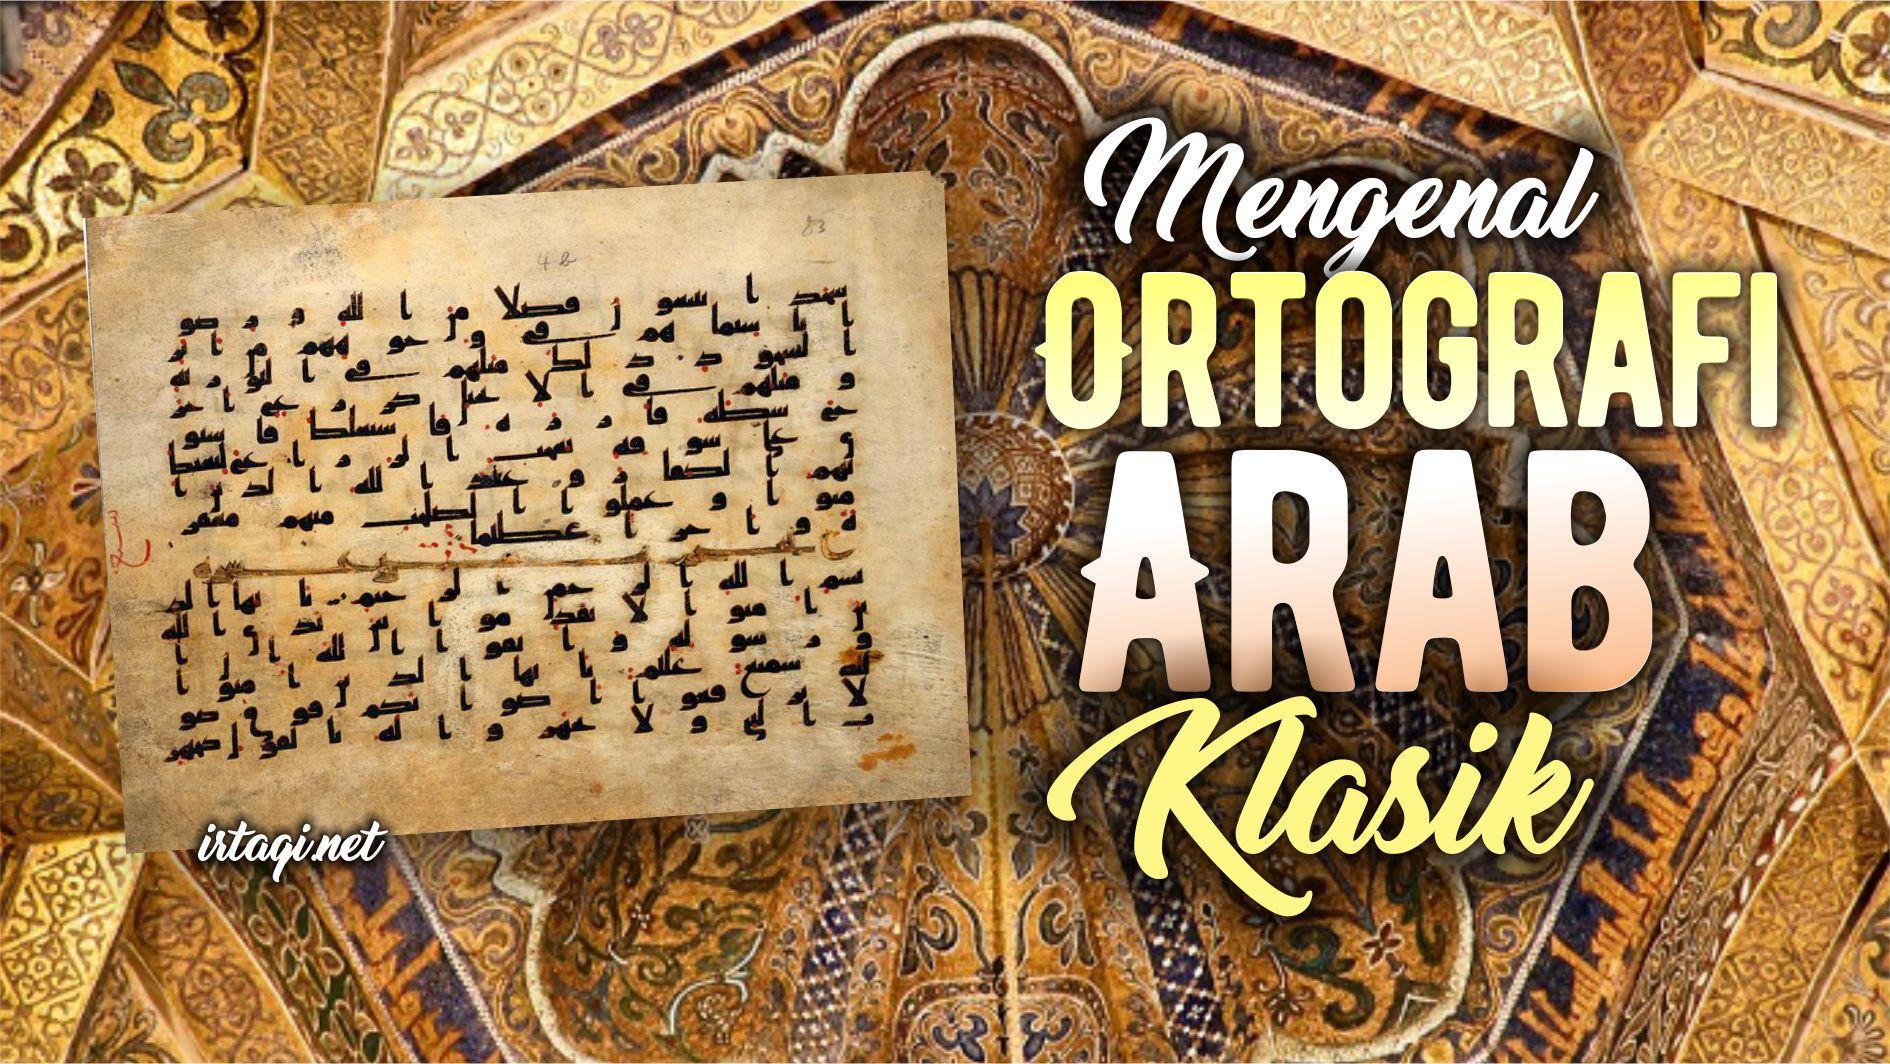 MENGENAL ORTOGRAFI ARAB KLASIK